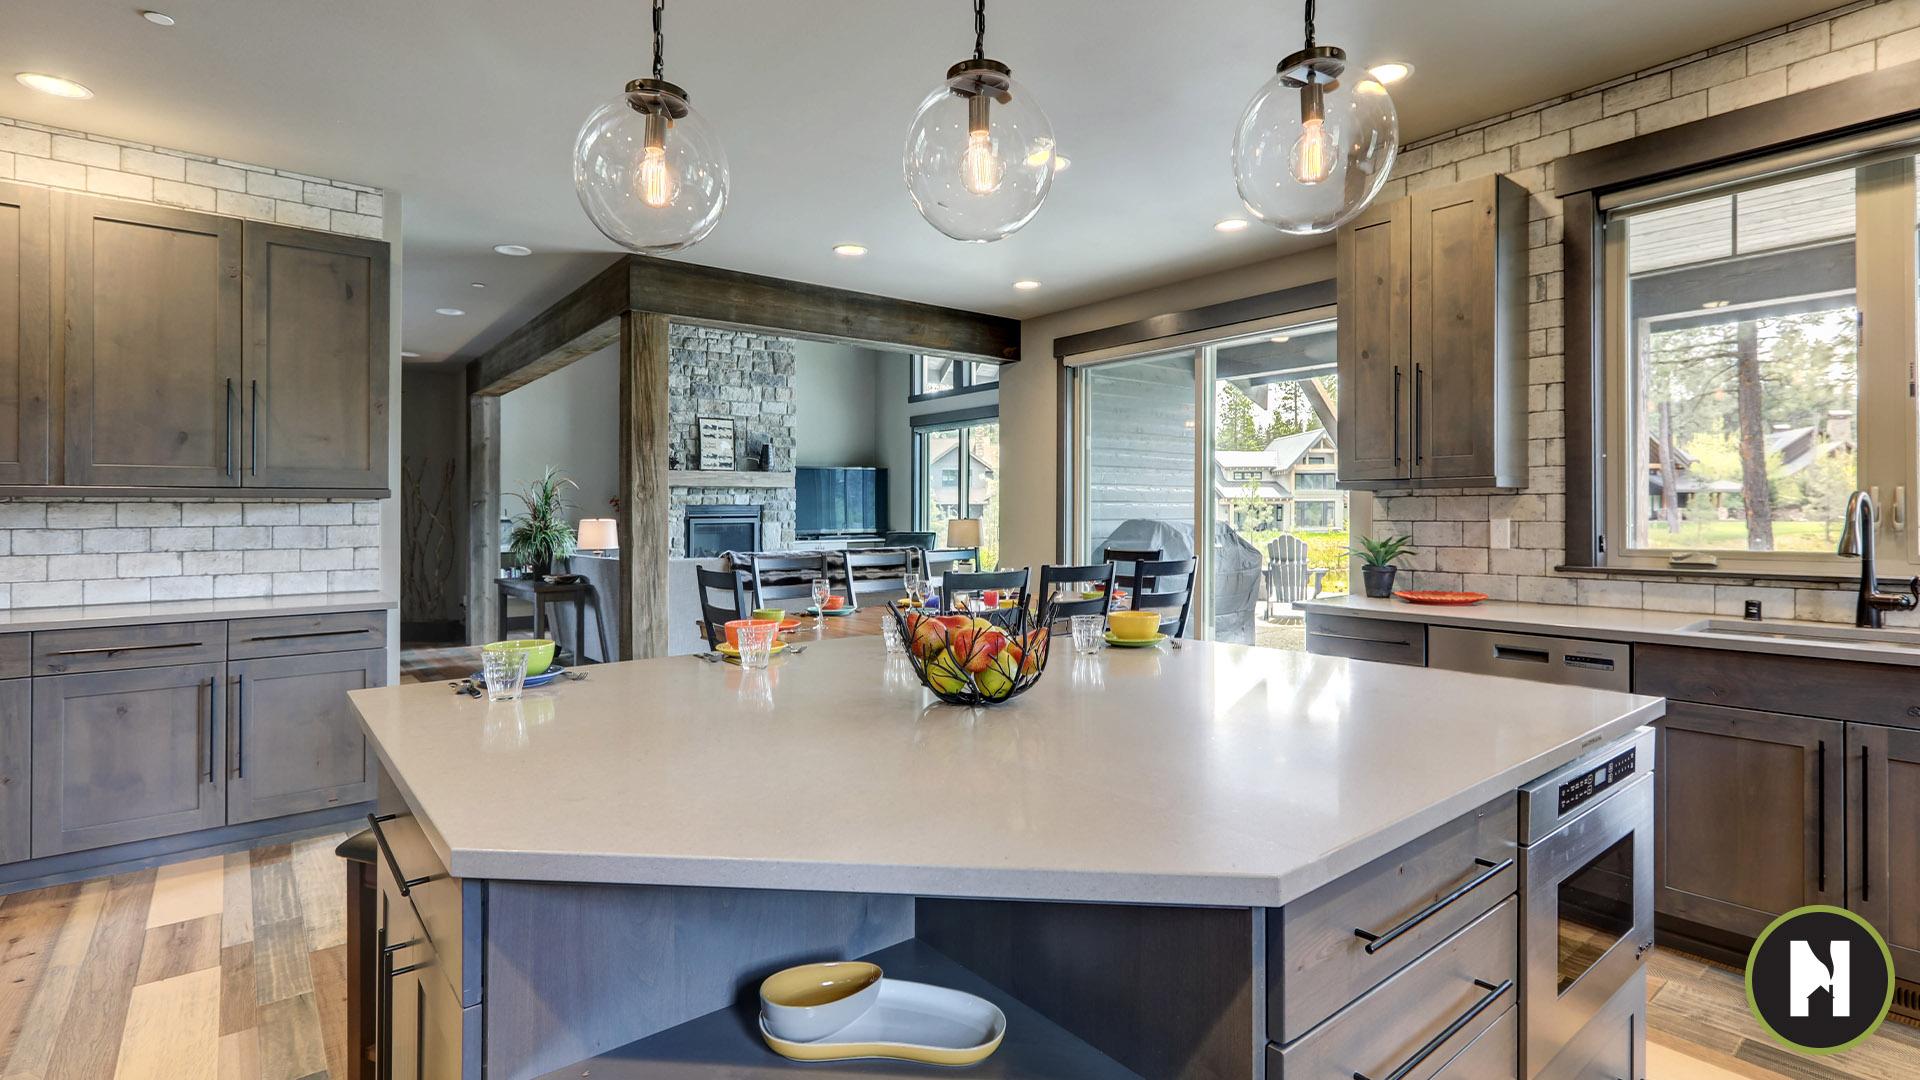 Kitchen Countertop Inspiration